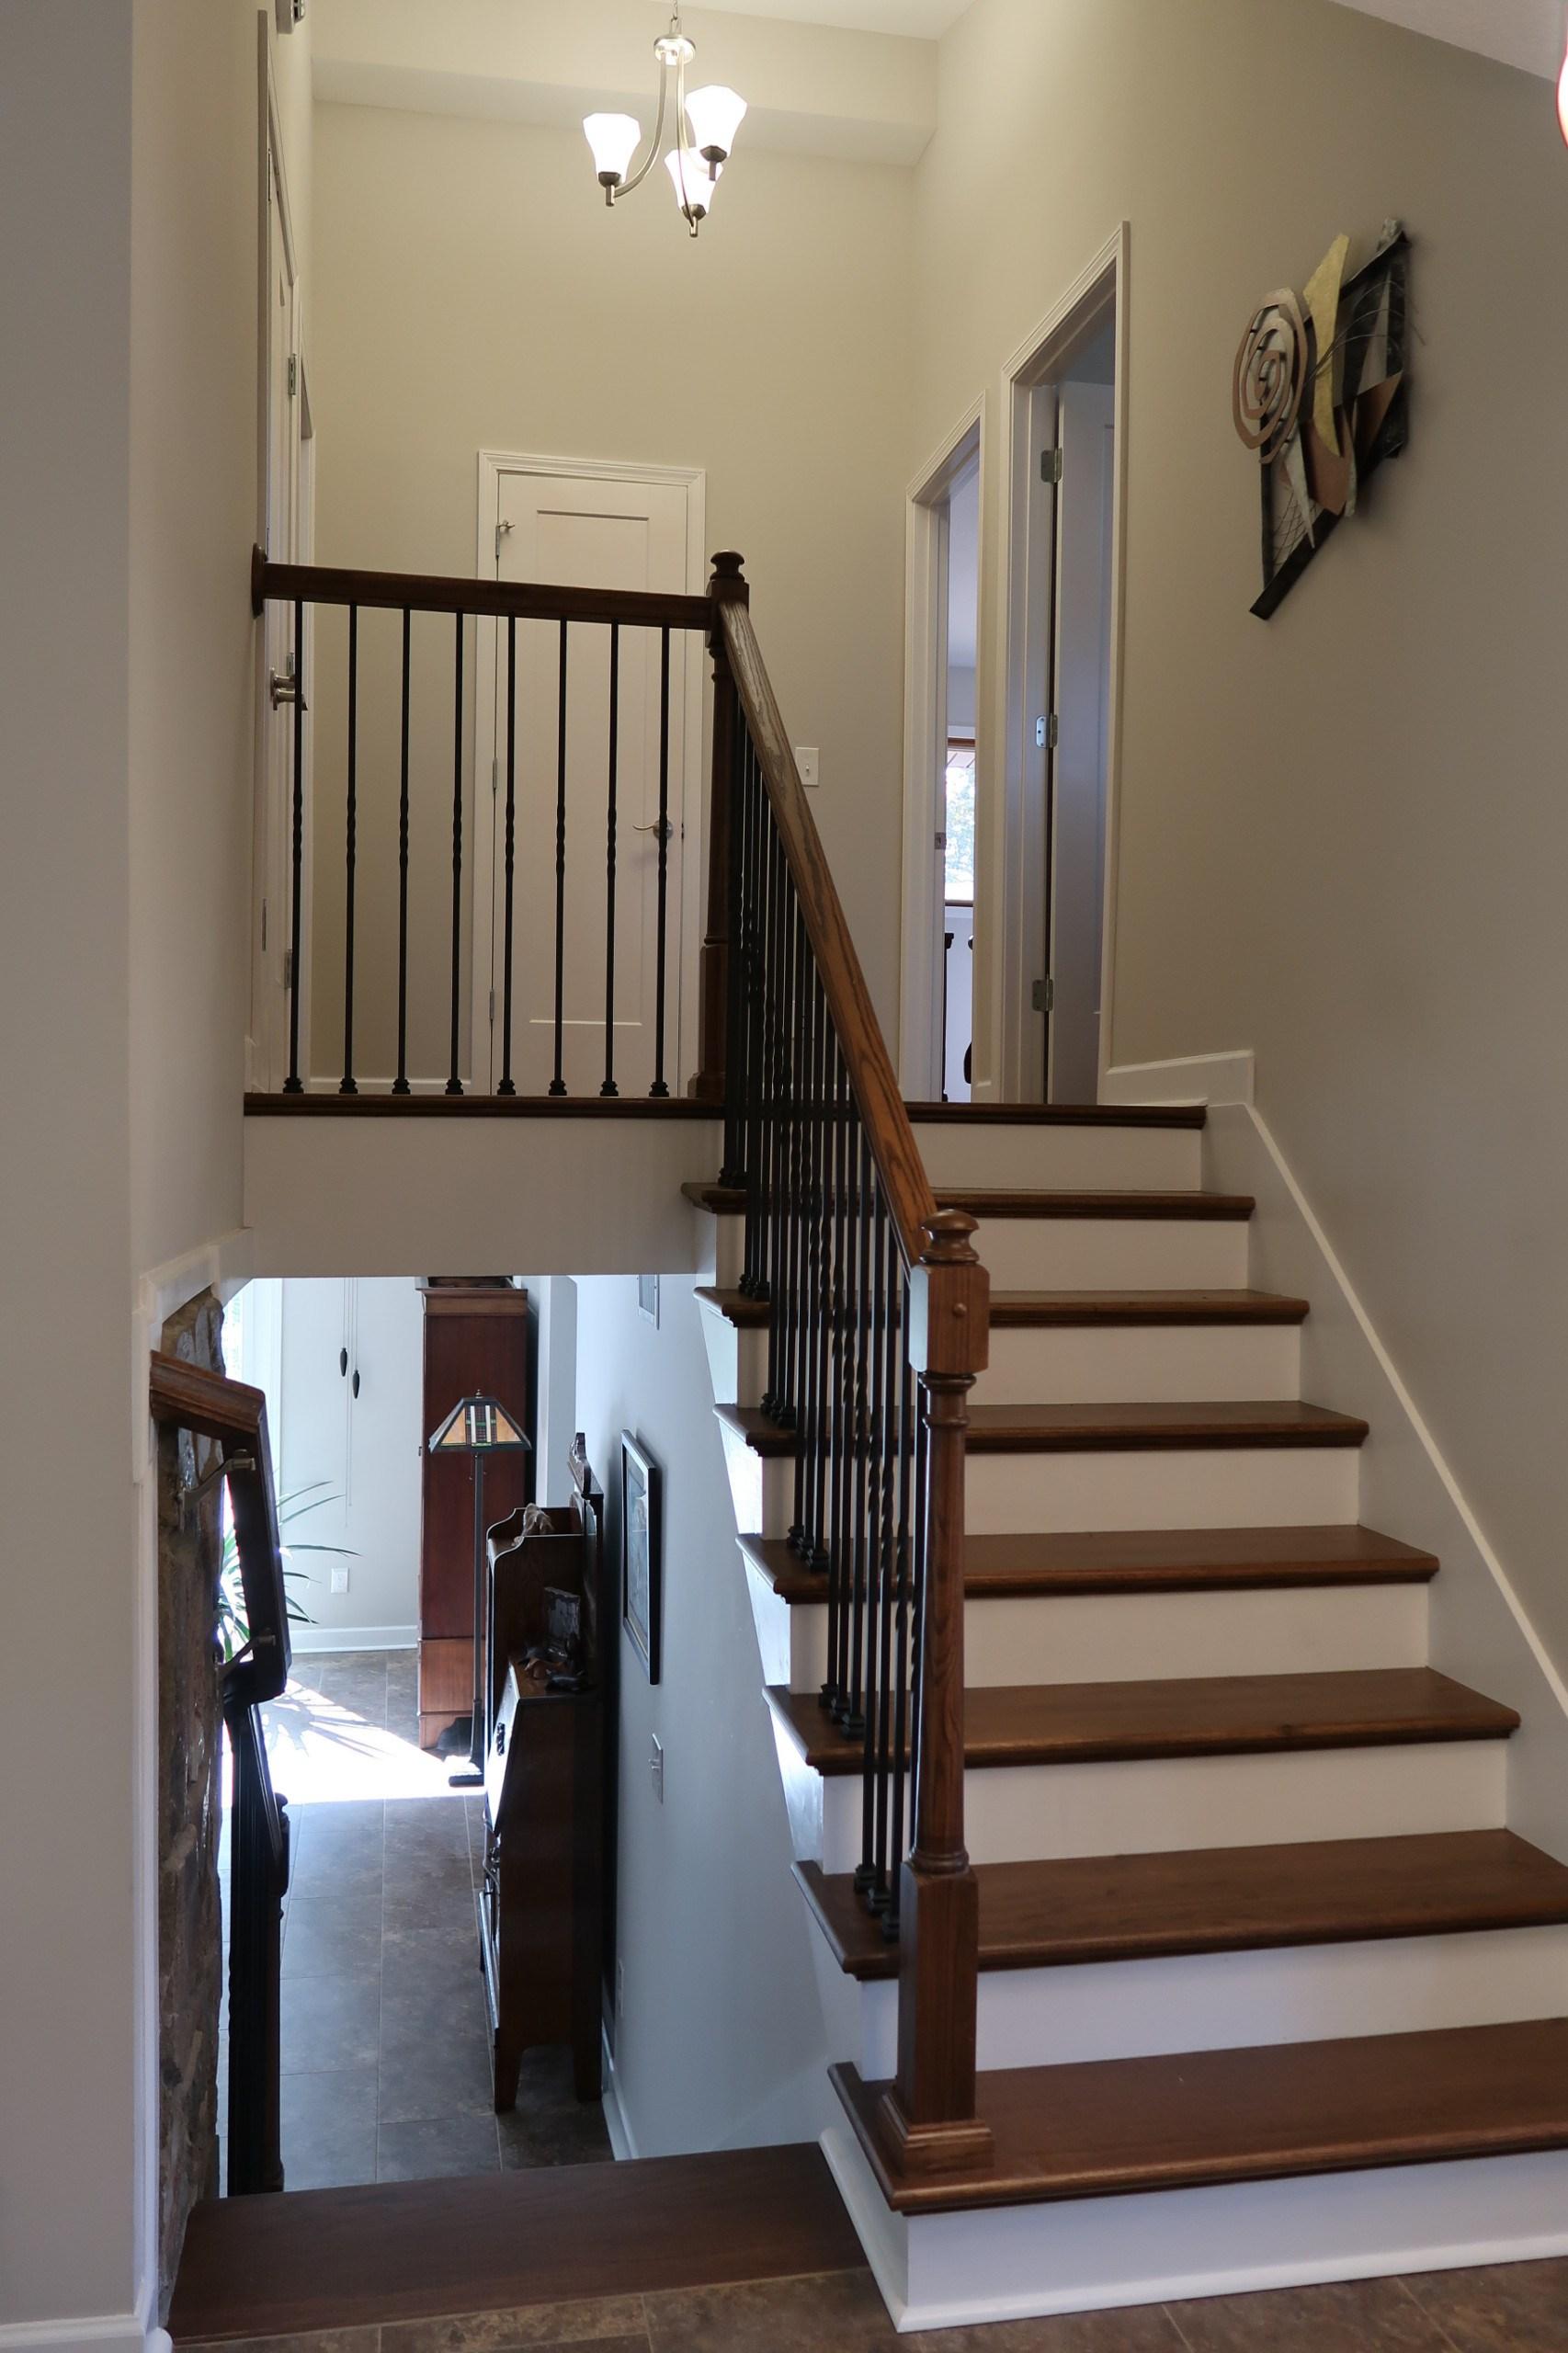 Split Level Traditional Staircase Photos Houzz | Split Level Stair Railing | Wrought Iron | Julia | Modern | Easy Diy | Fancy